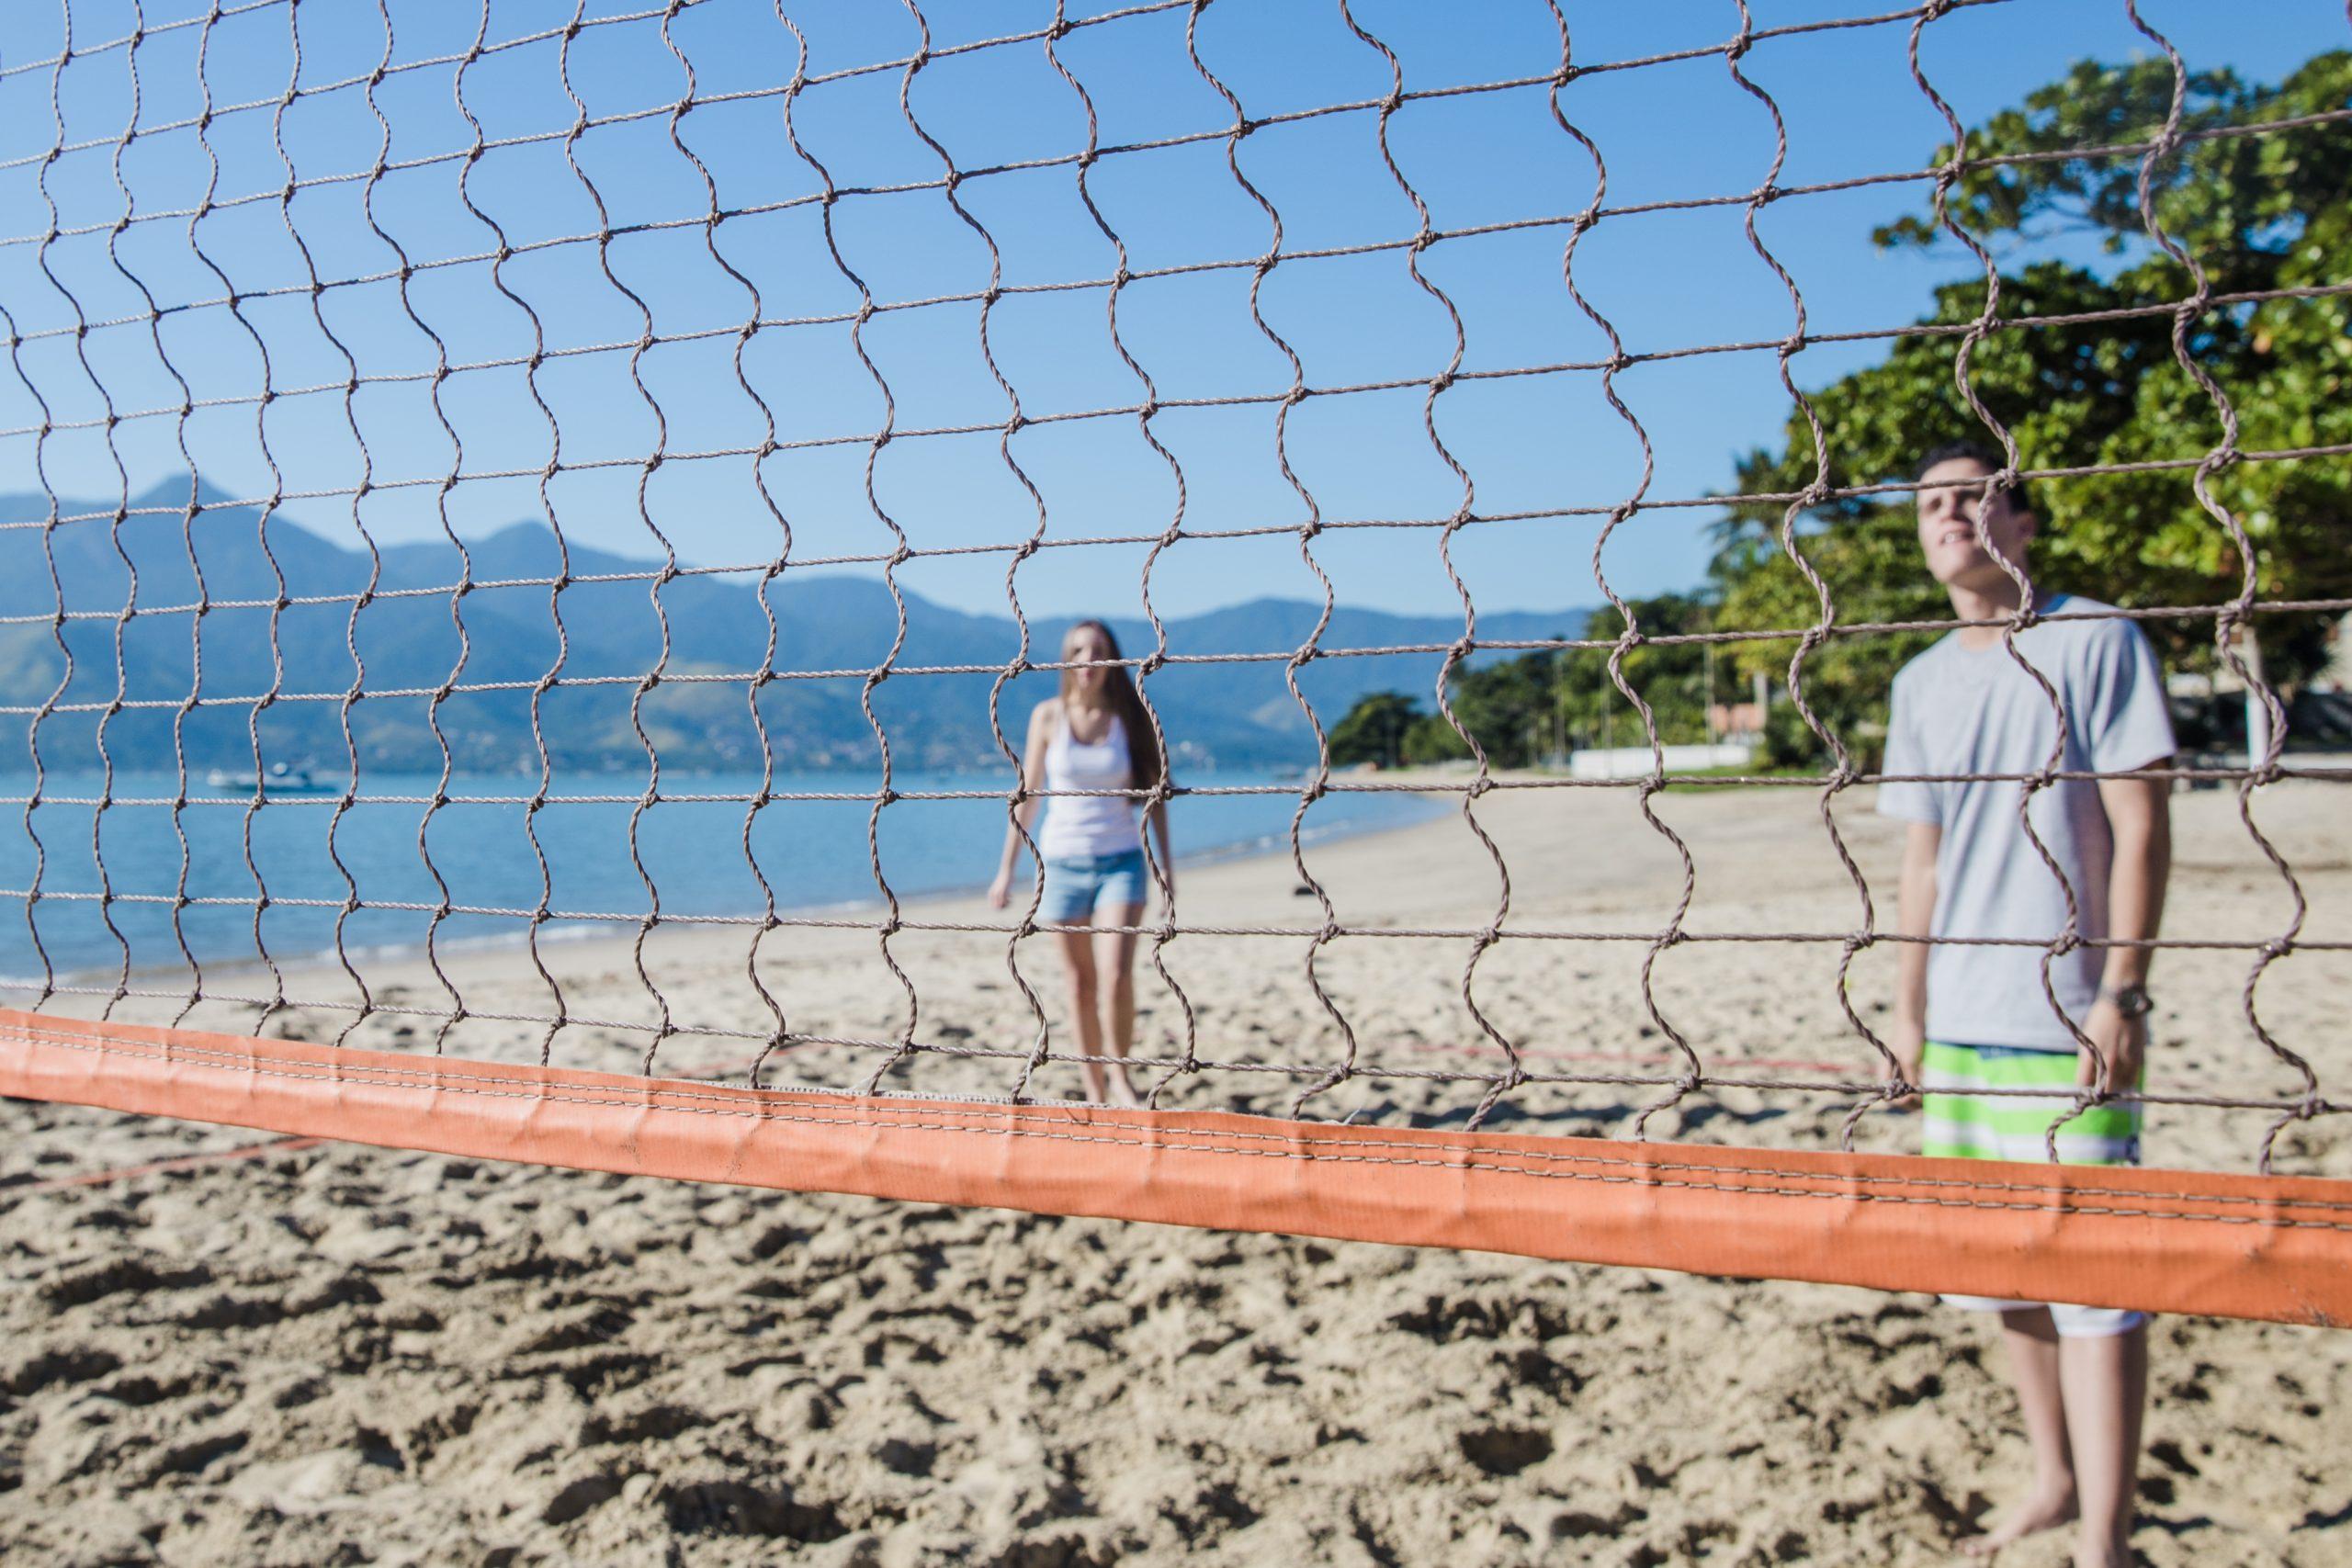 footvolley net